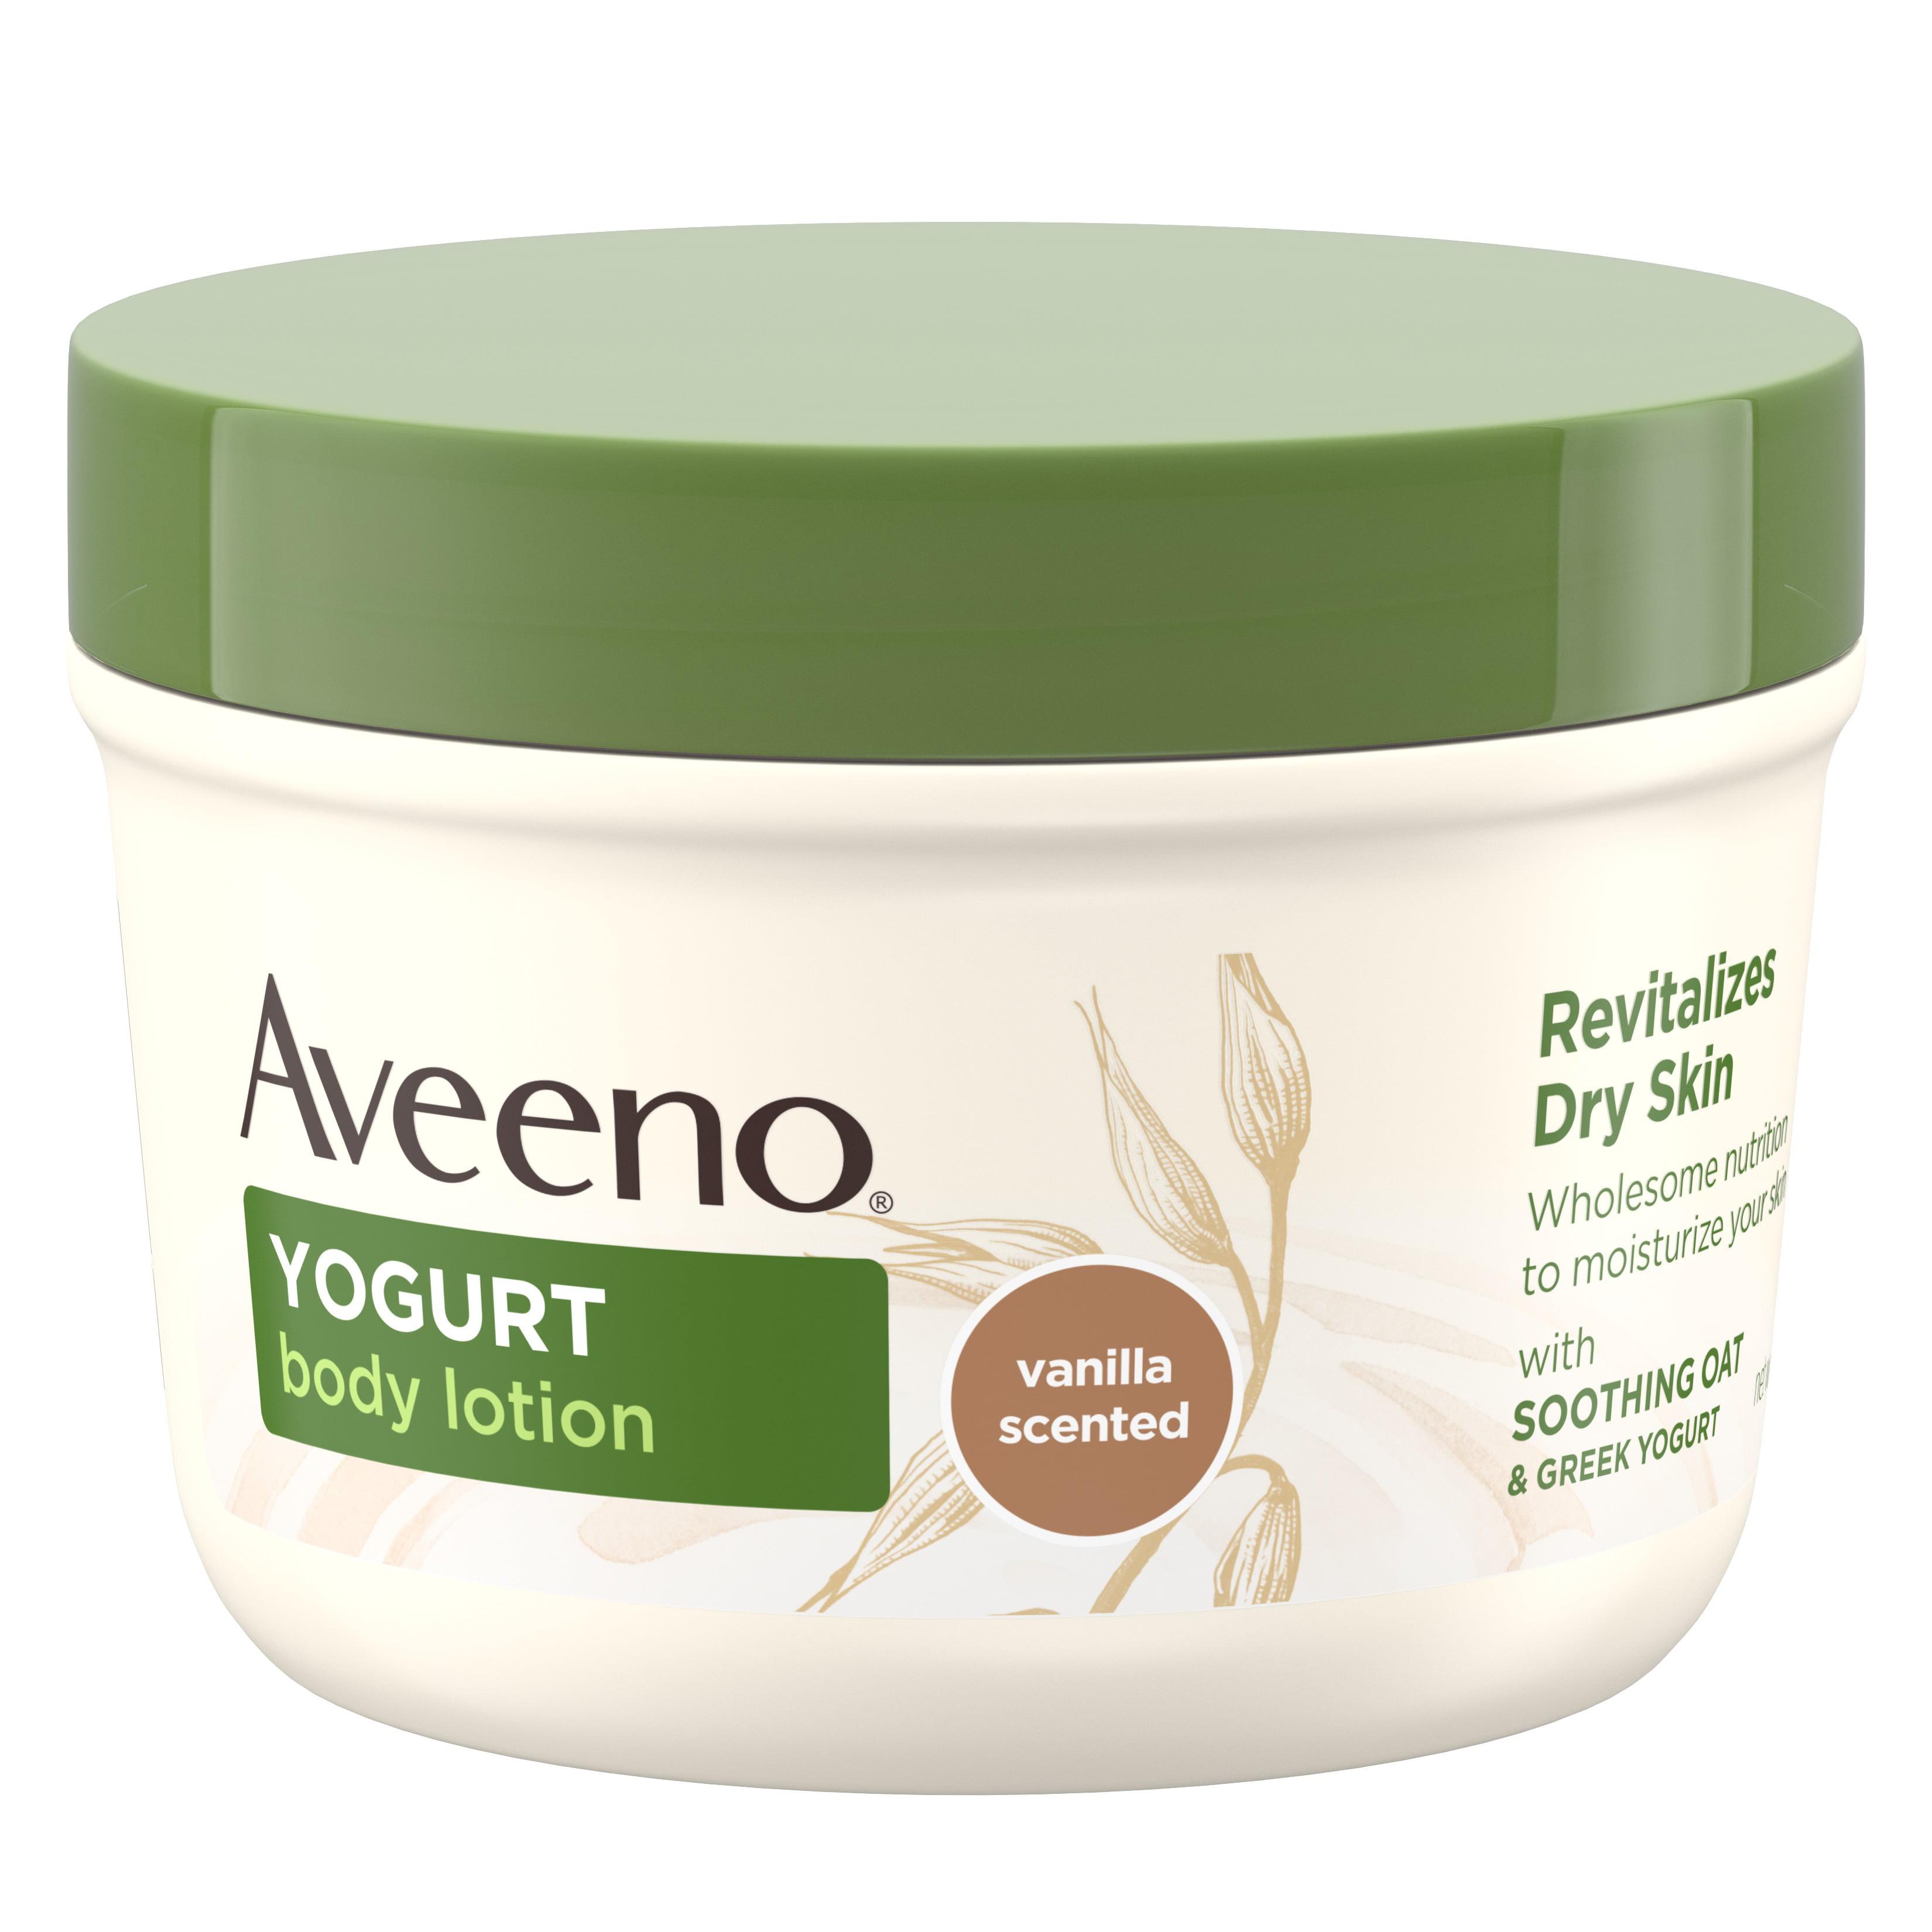 Aveeno Daily Moisturizing Yogurt Body Lotion for Dry Skin 6c469f986a2